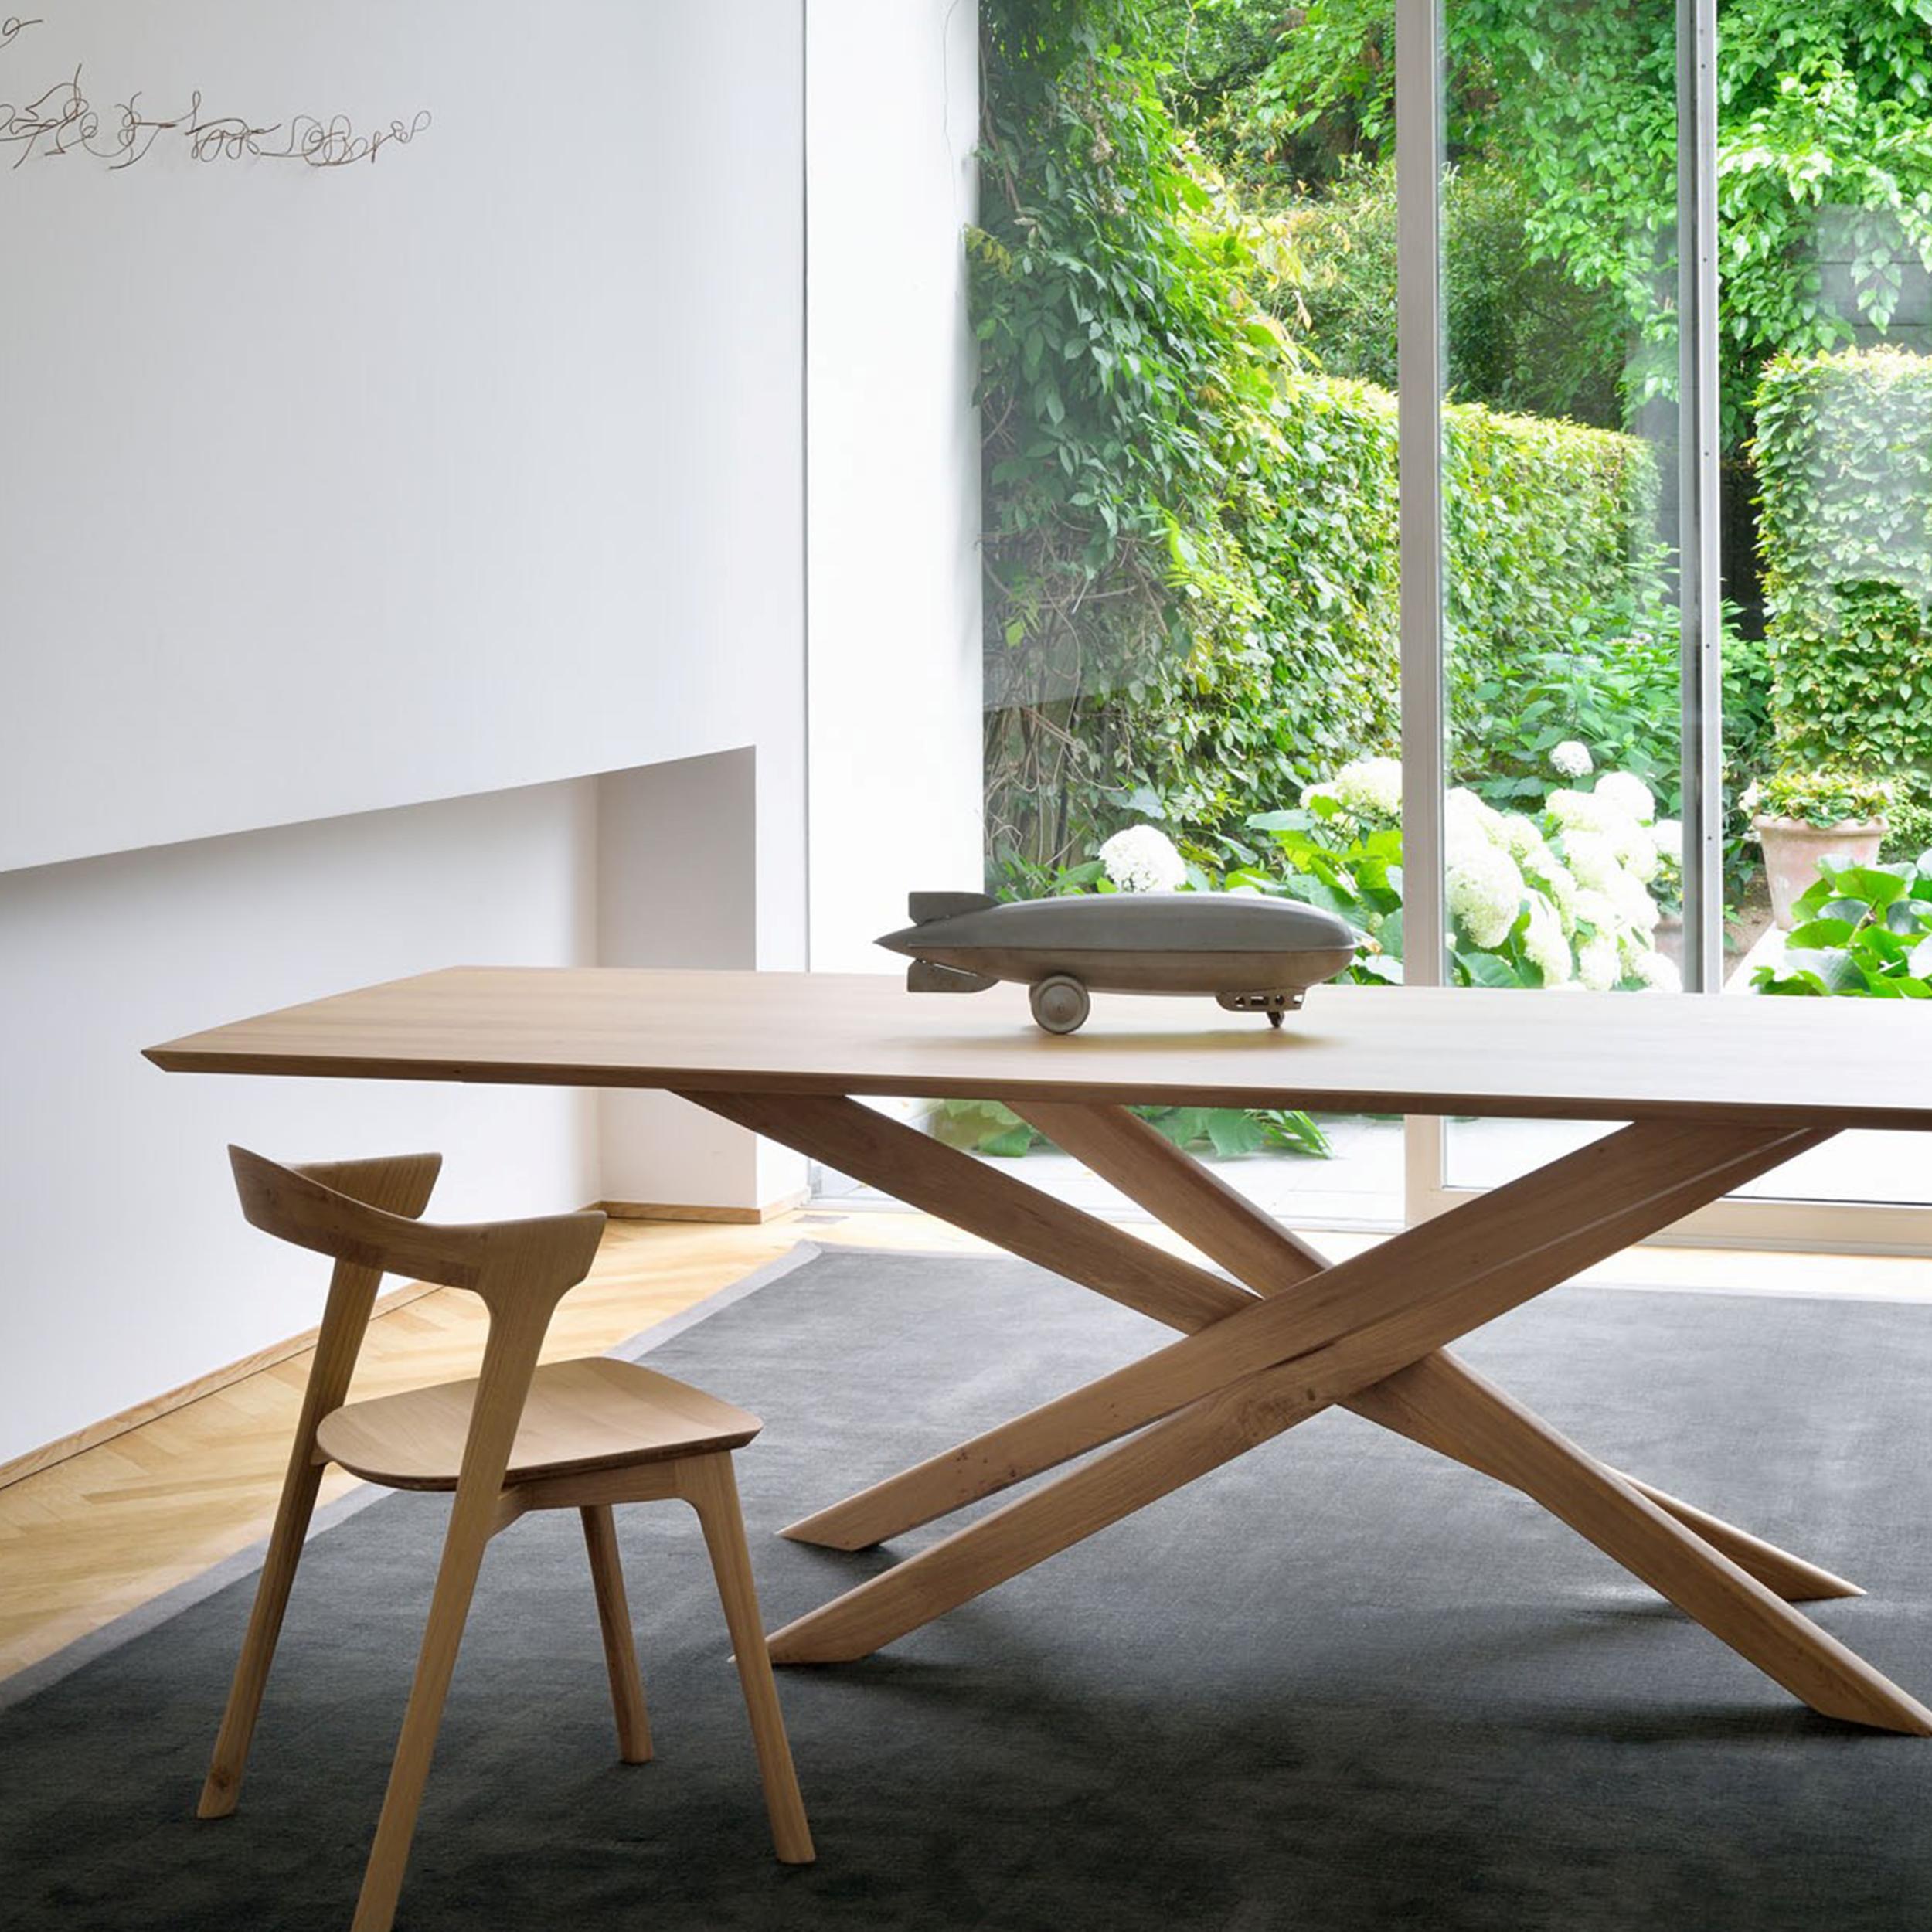 51490-Oak-Bok-chair-50180-Oak-Mikado-dining-table-3-copy.jpg.png